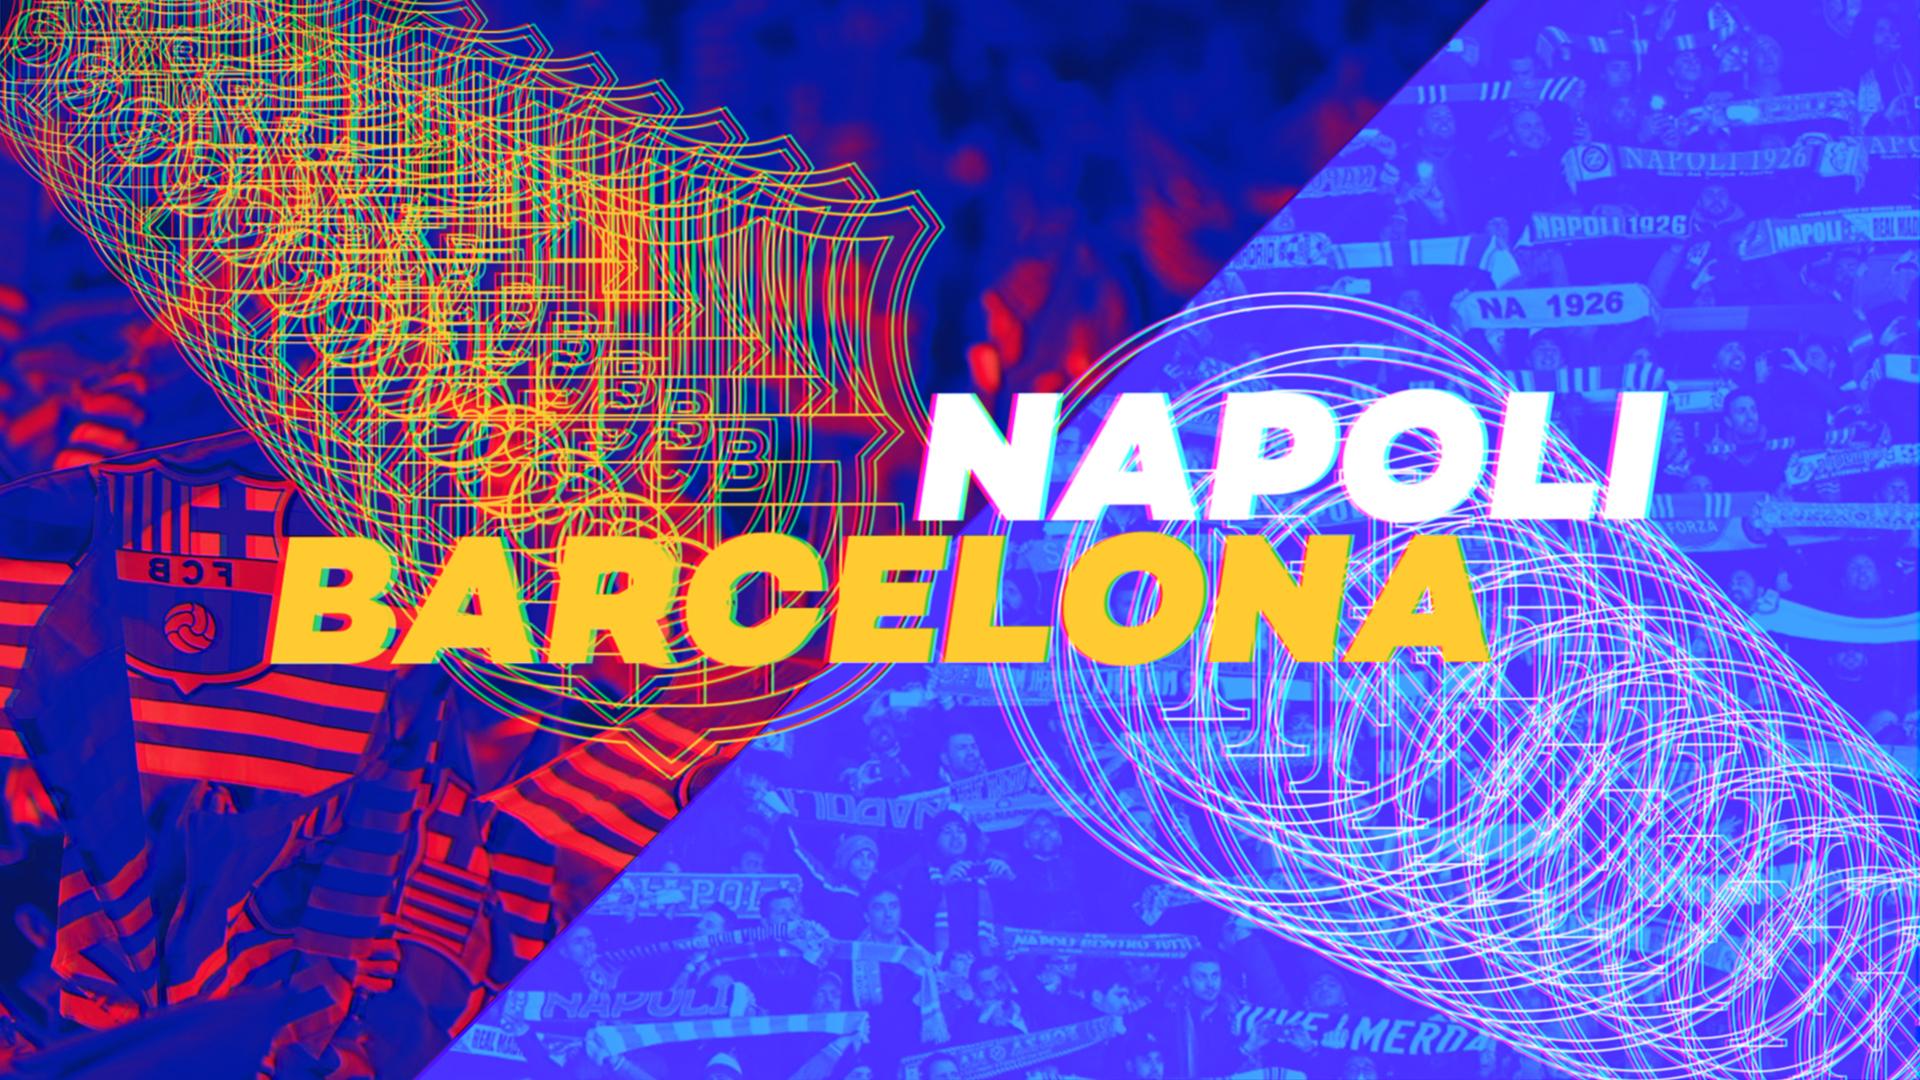 GUIA DA CHAMPIONS: Barcelona e Napoli